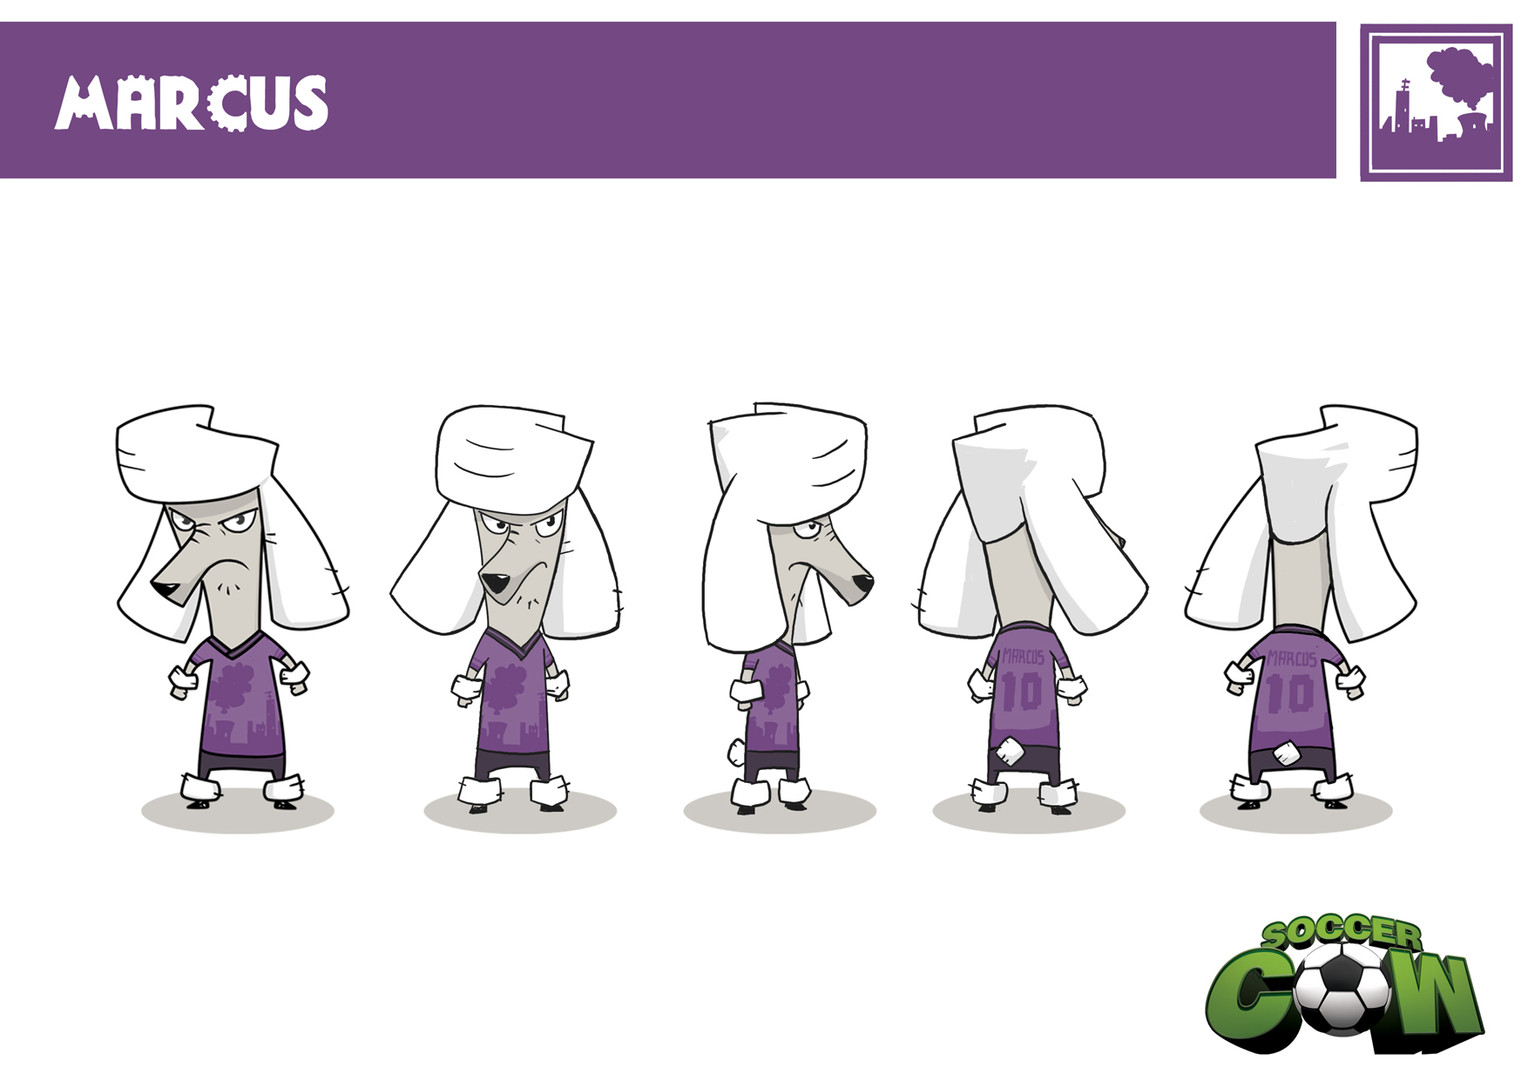 SC_giros_04_Marcus.JPG